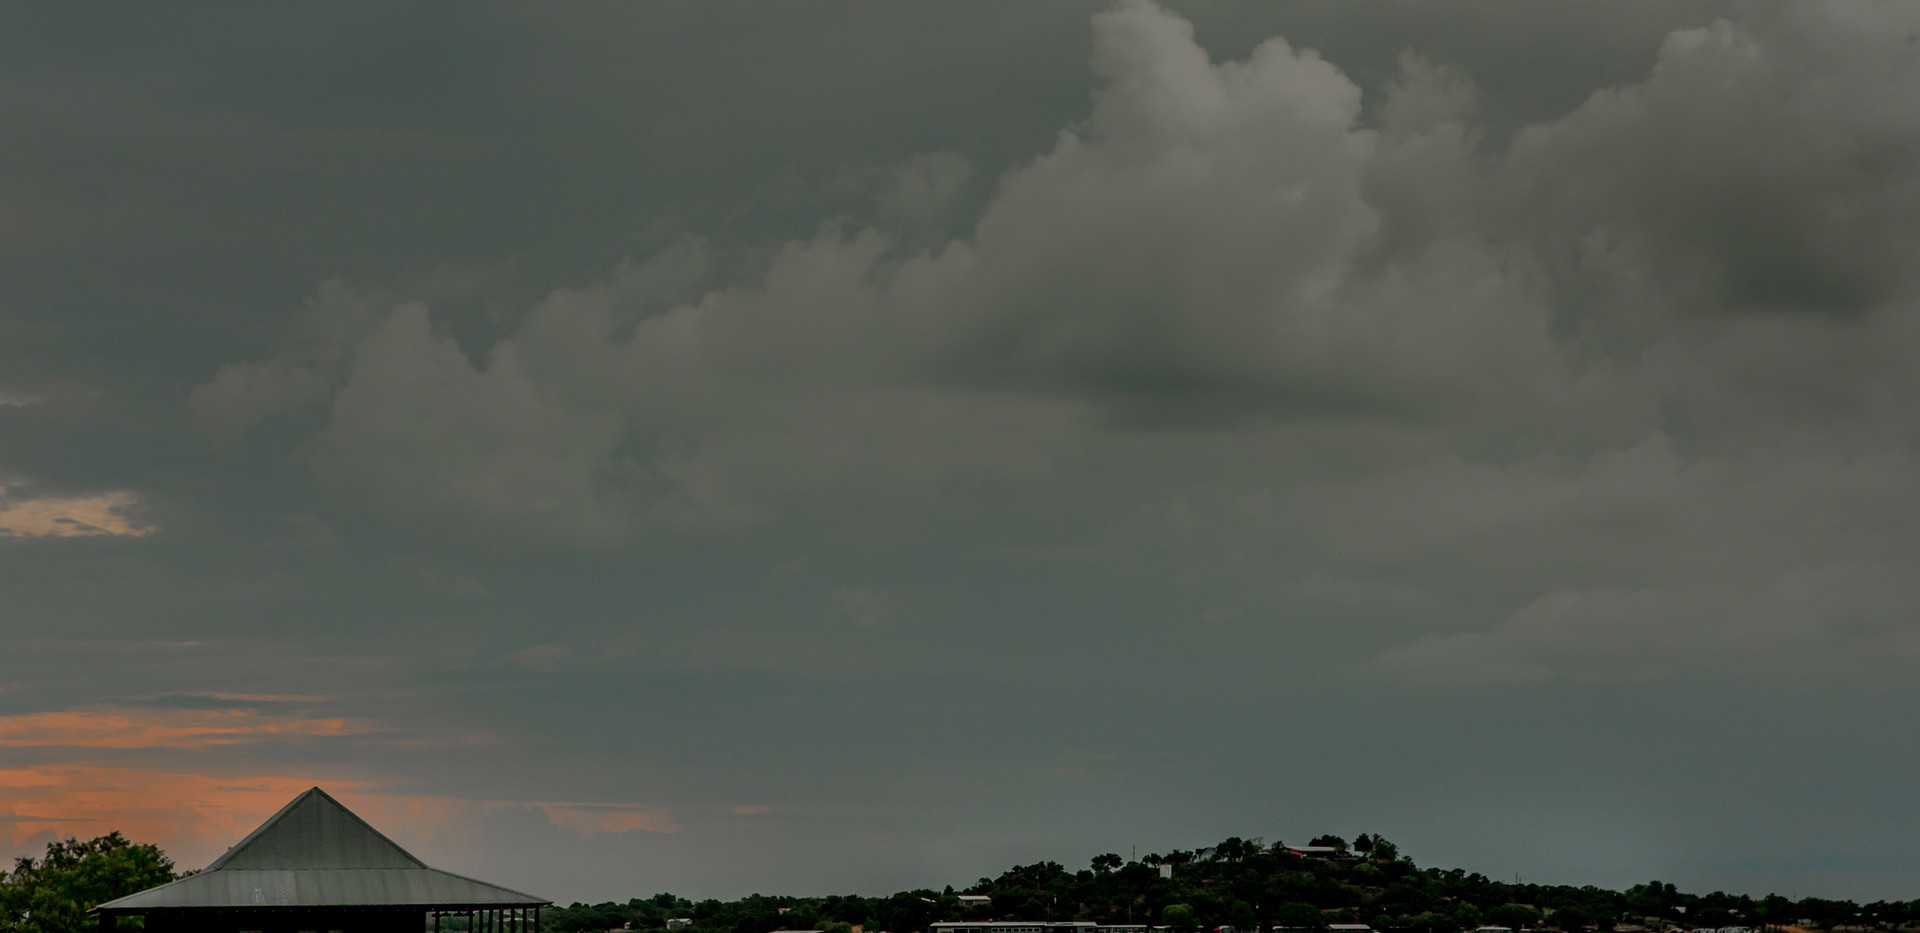 CanyonoftheEagles-2.jpg